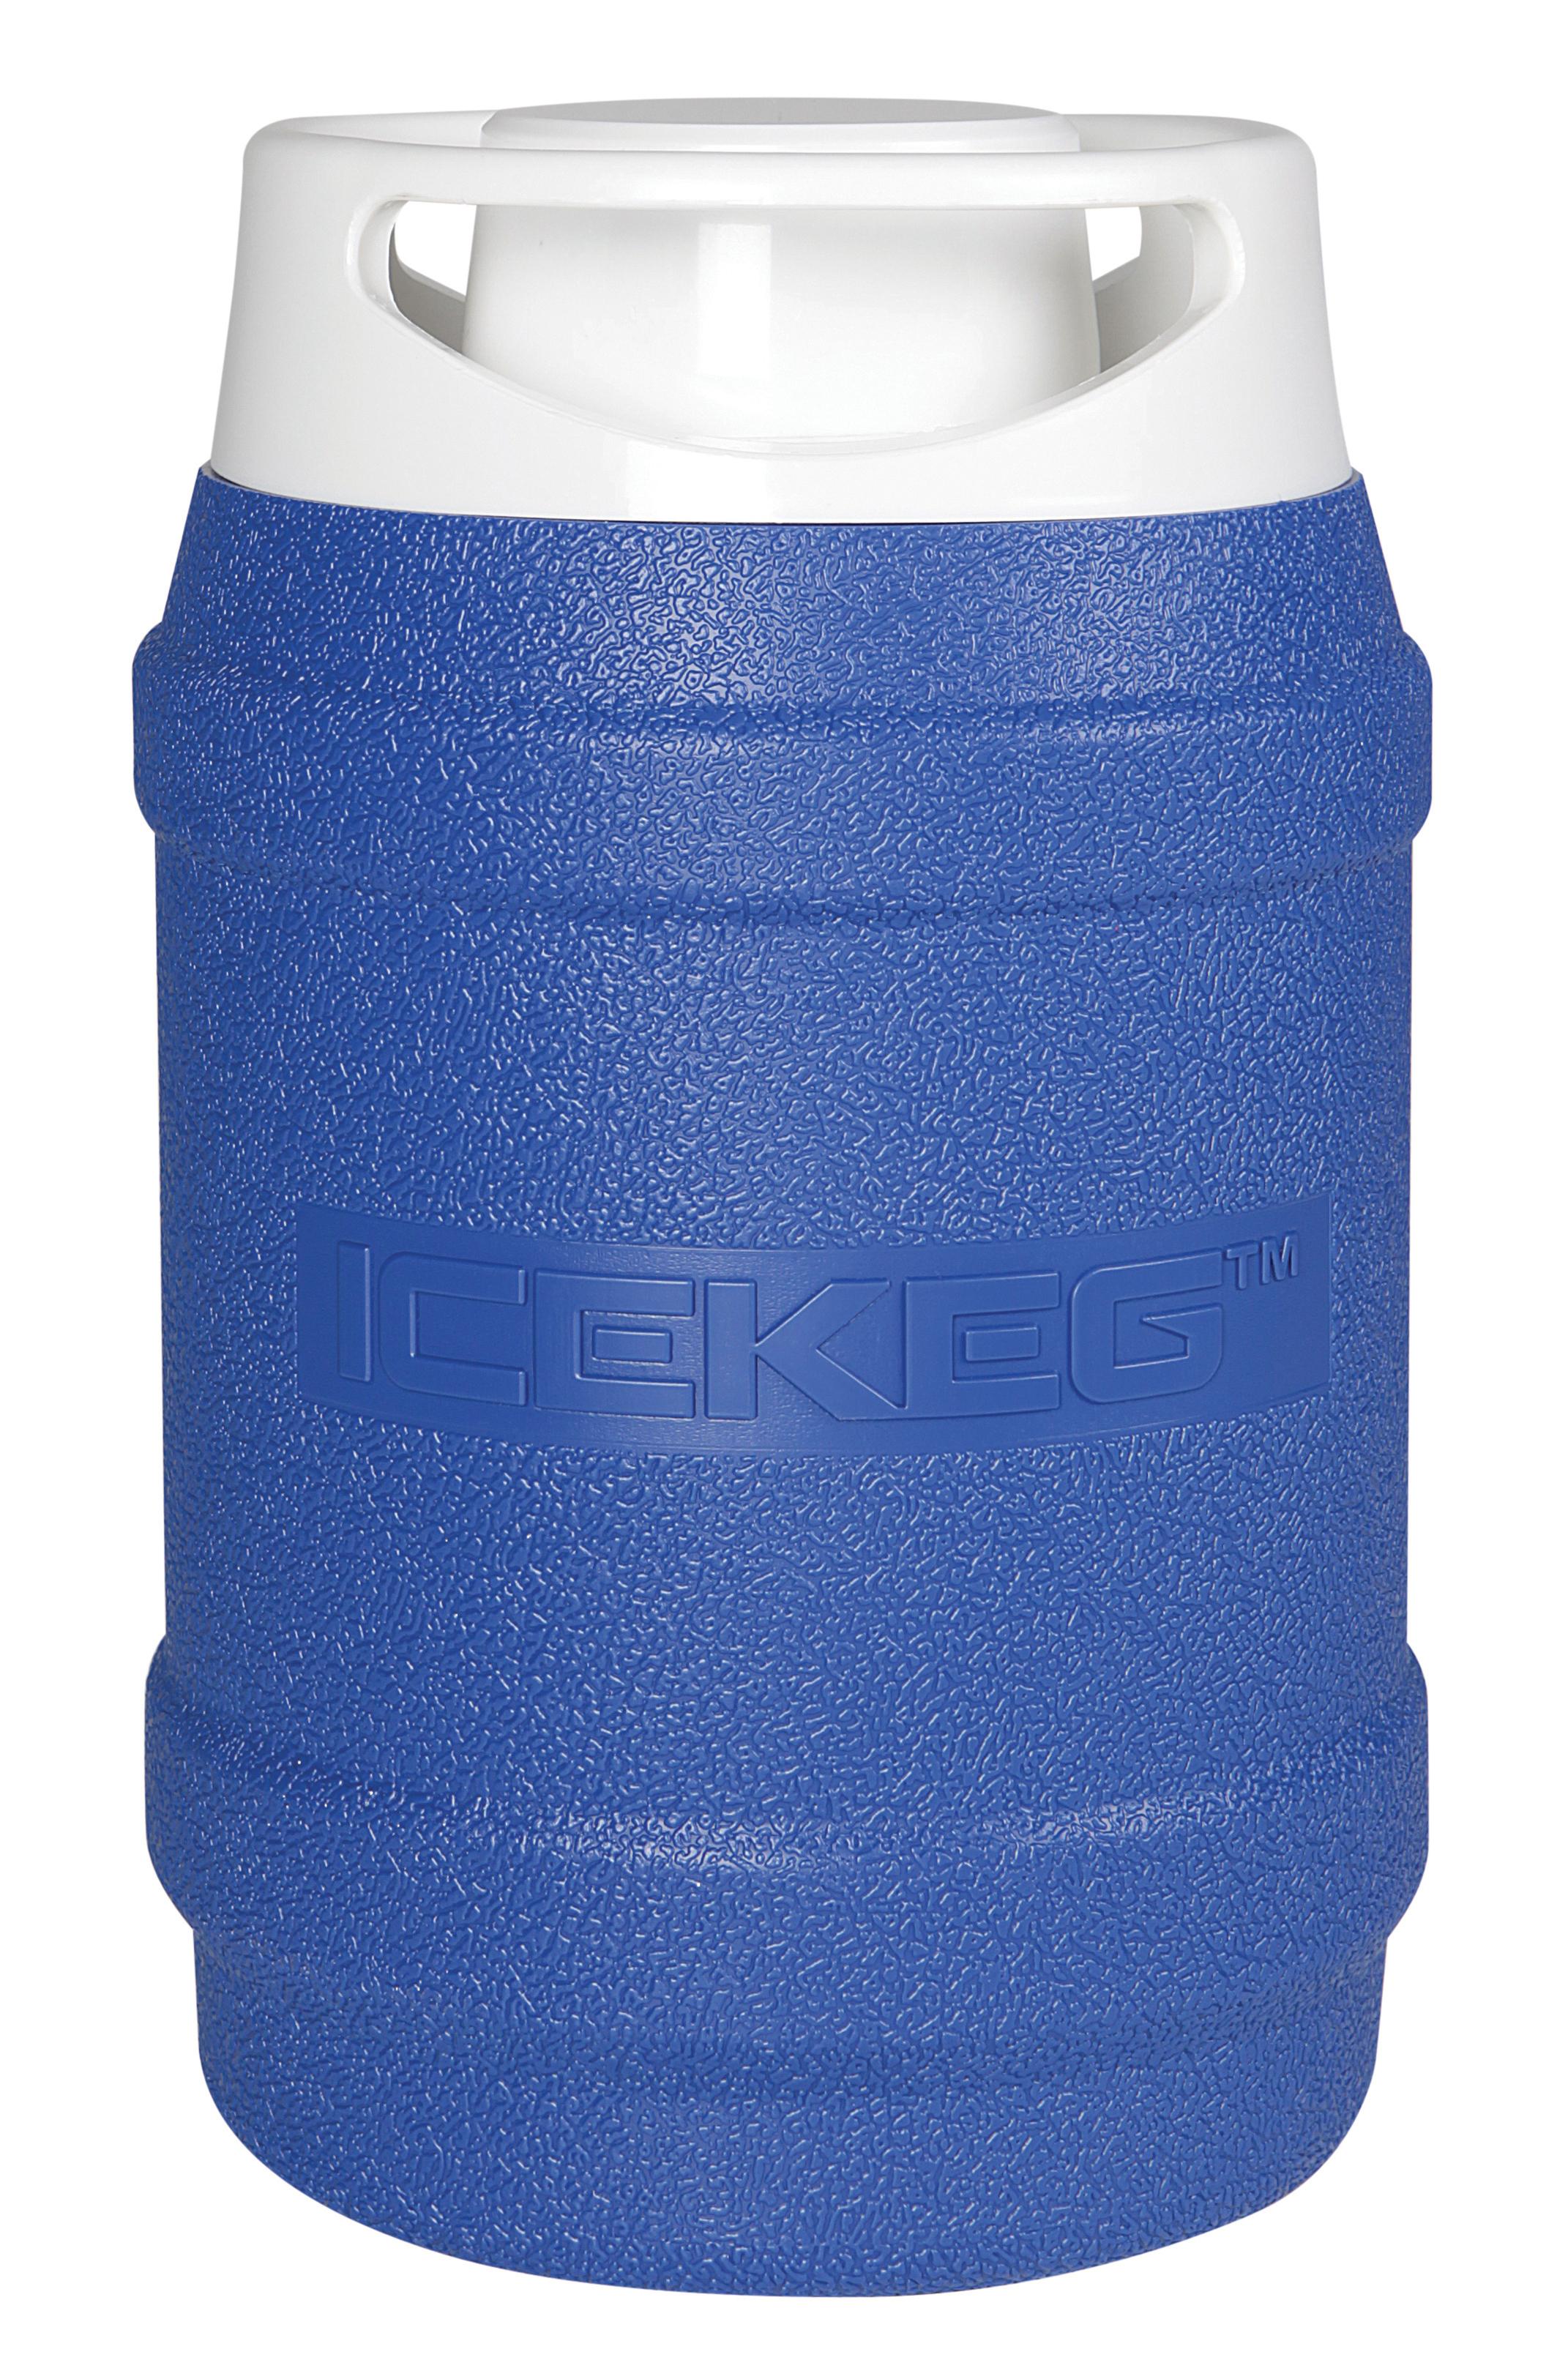 Icekeg 2.5L